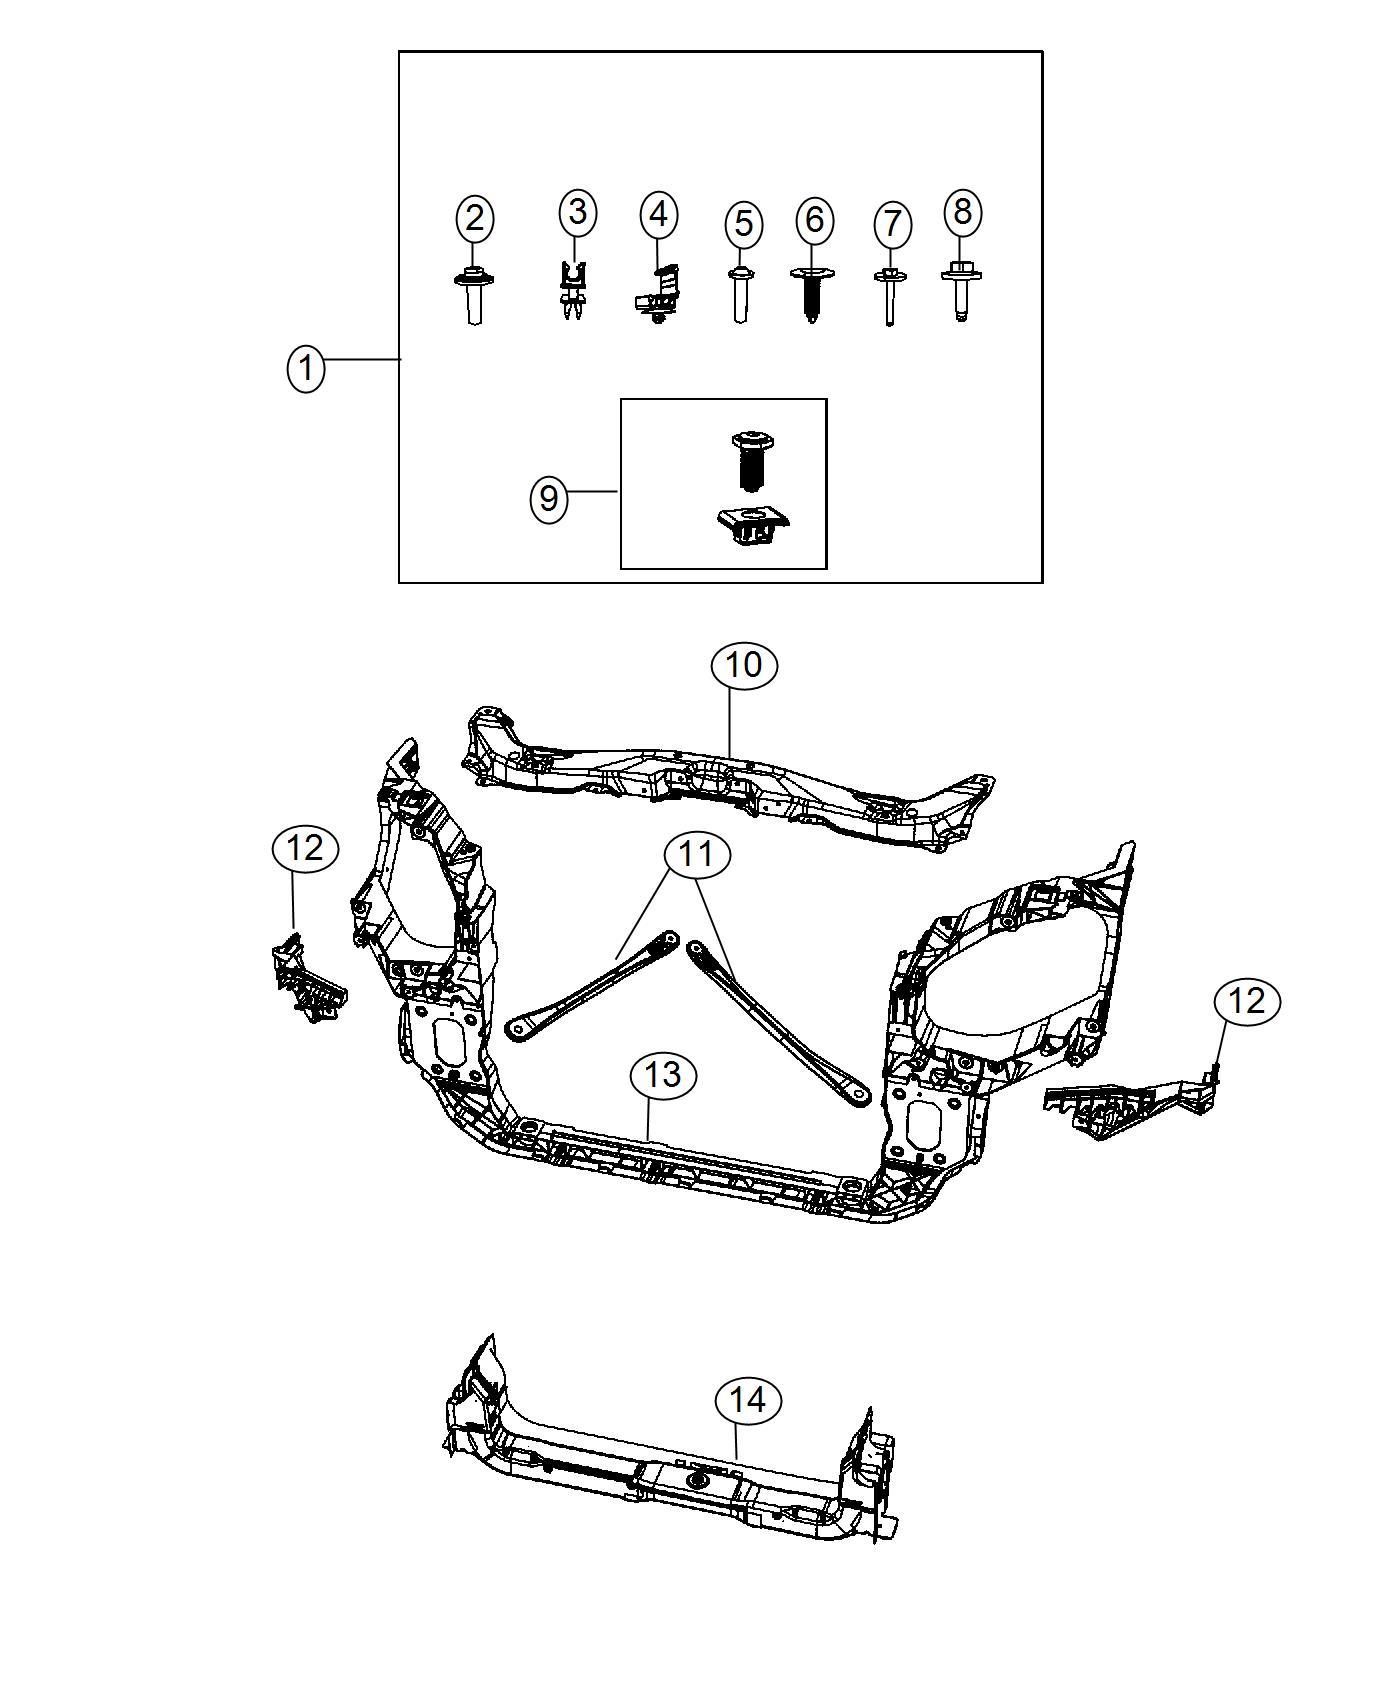 Chevy Malibu Front End Diagram